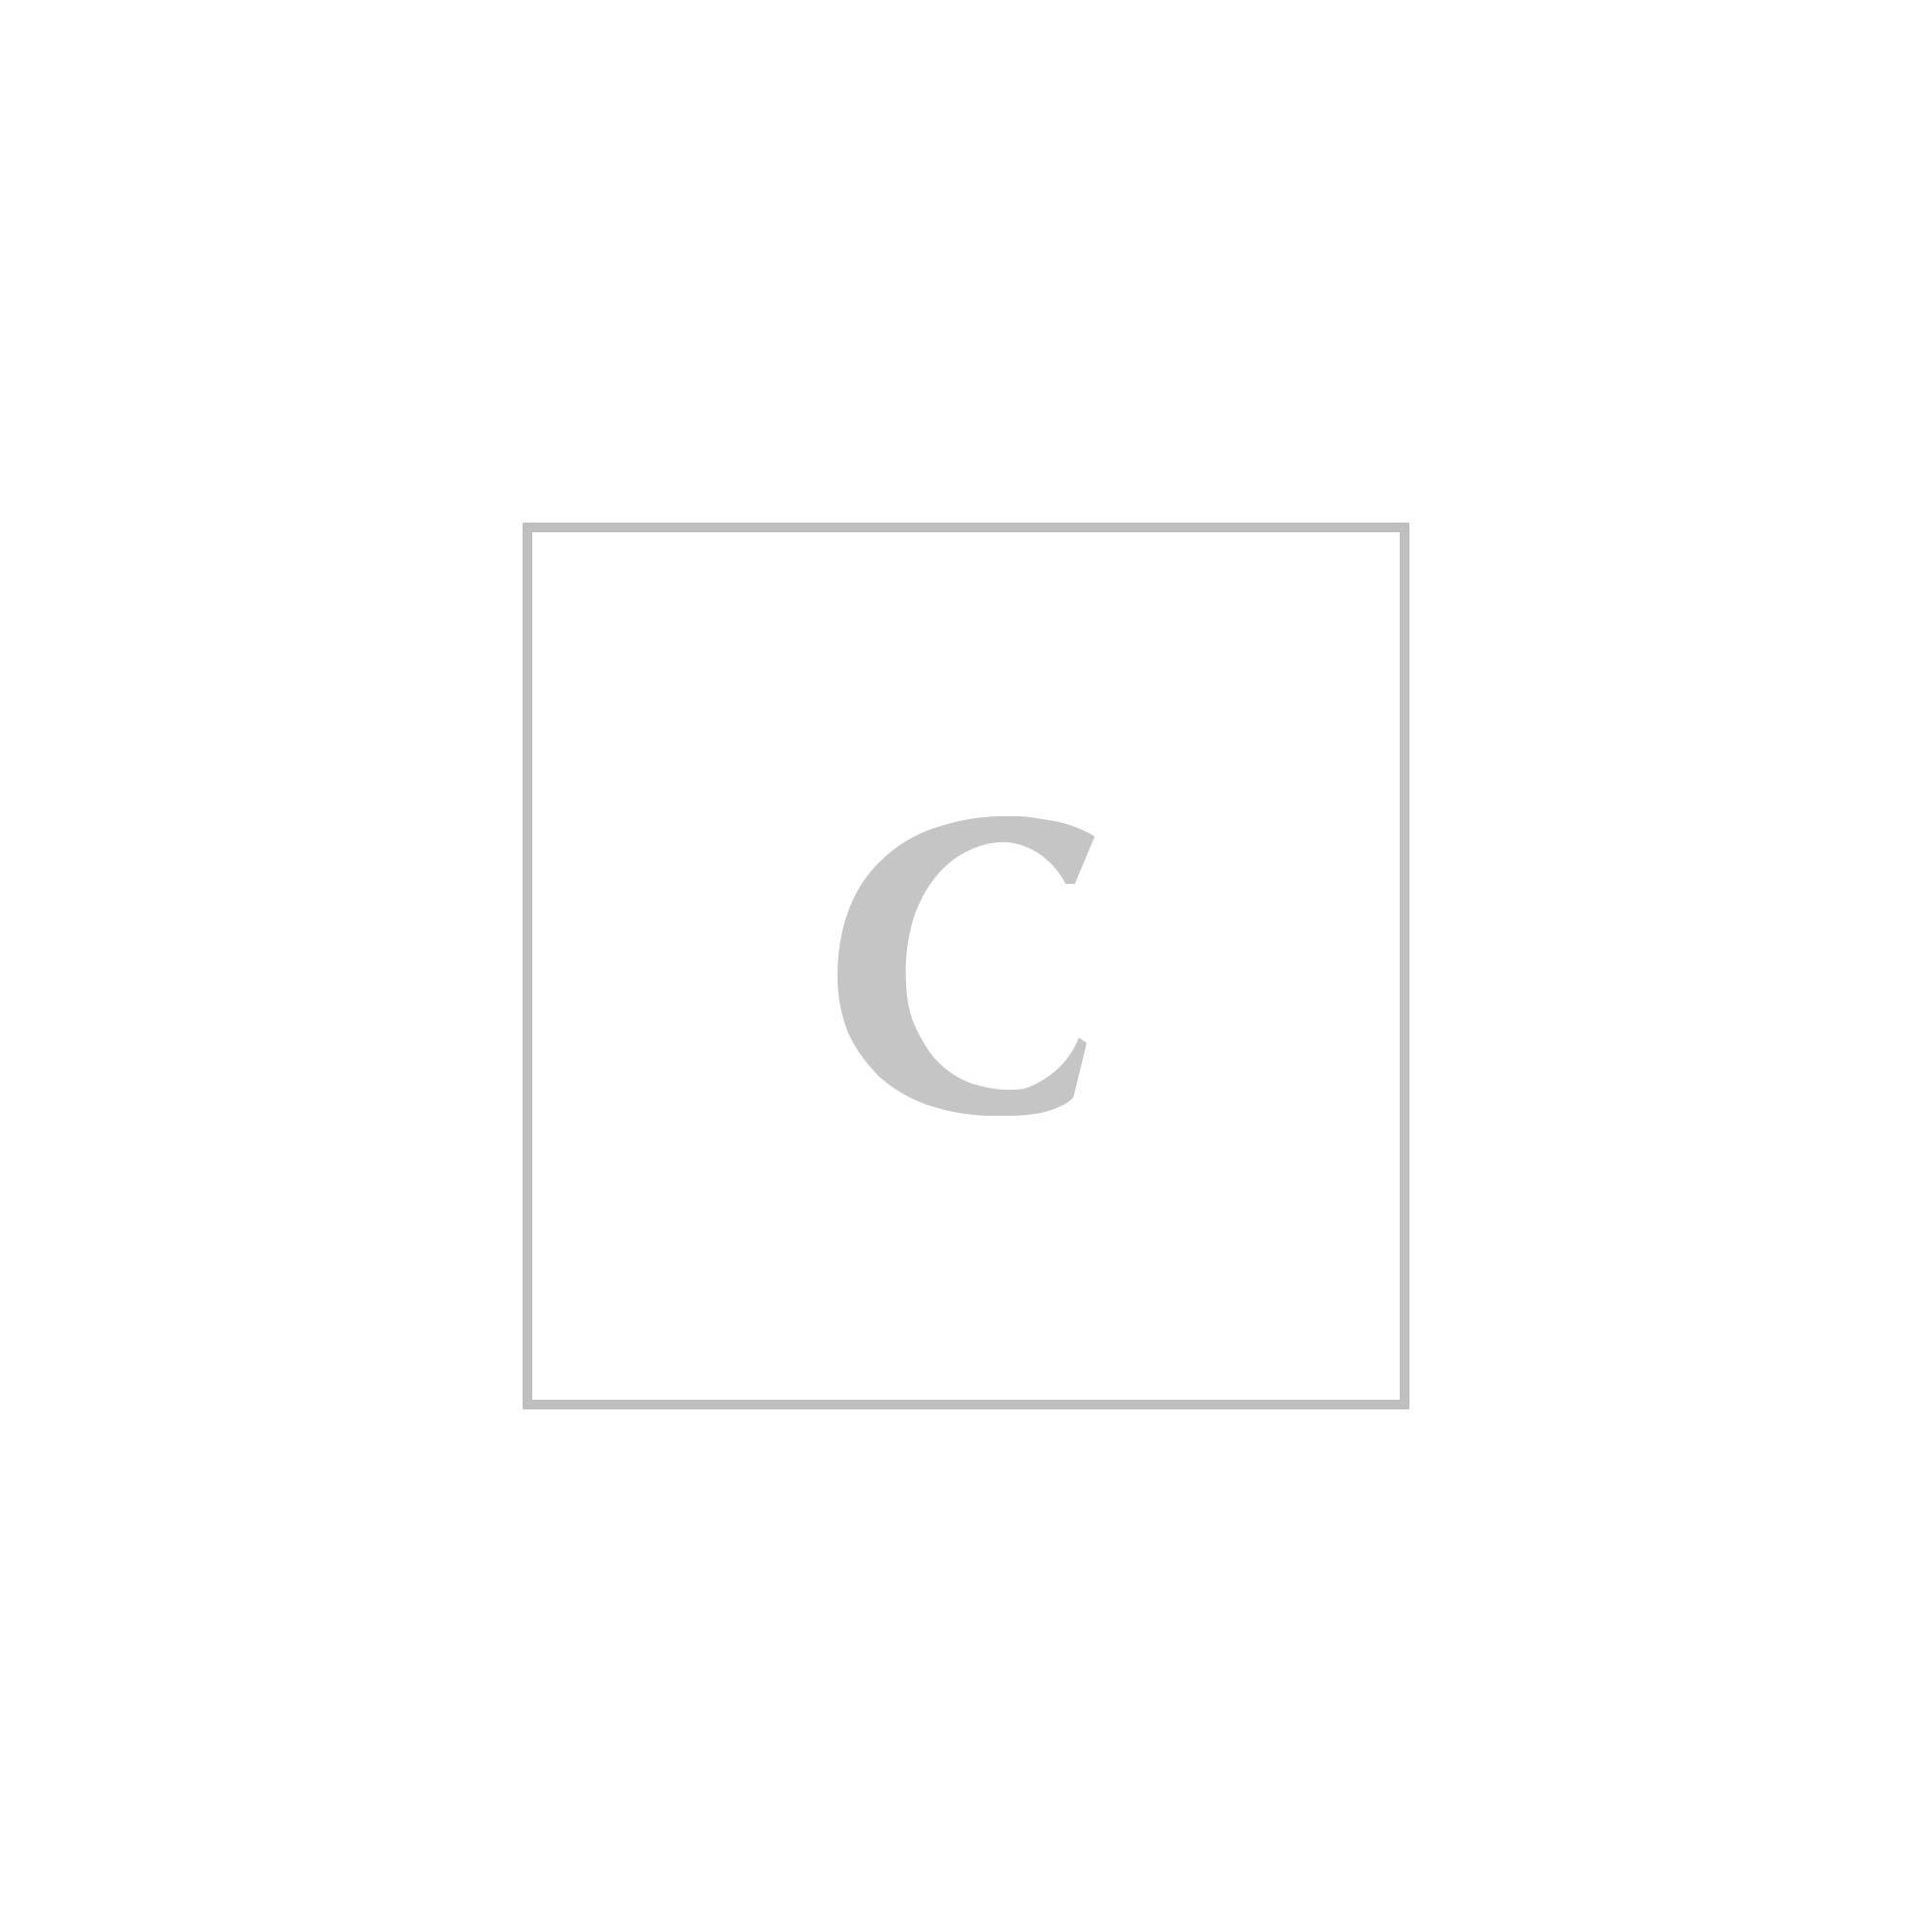 burberry calzature donna ciabatte furley tpu check